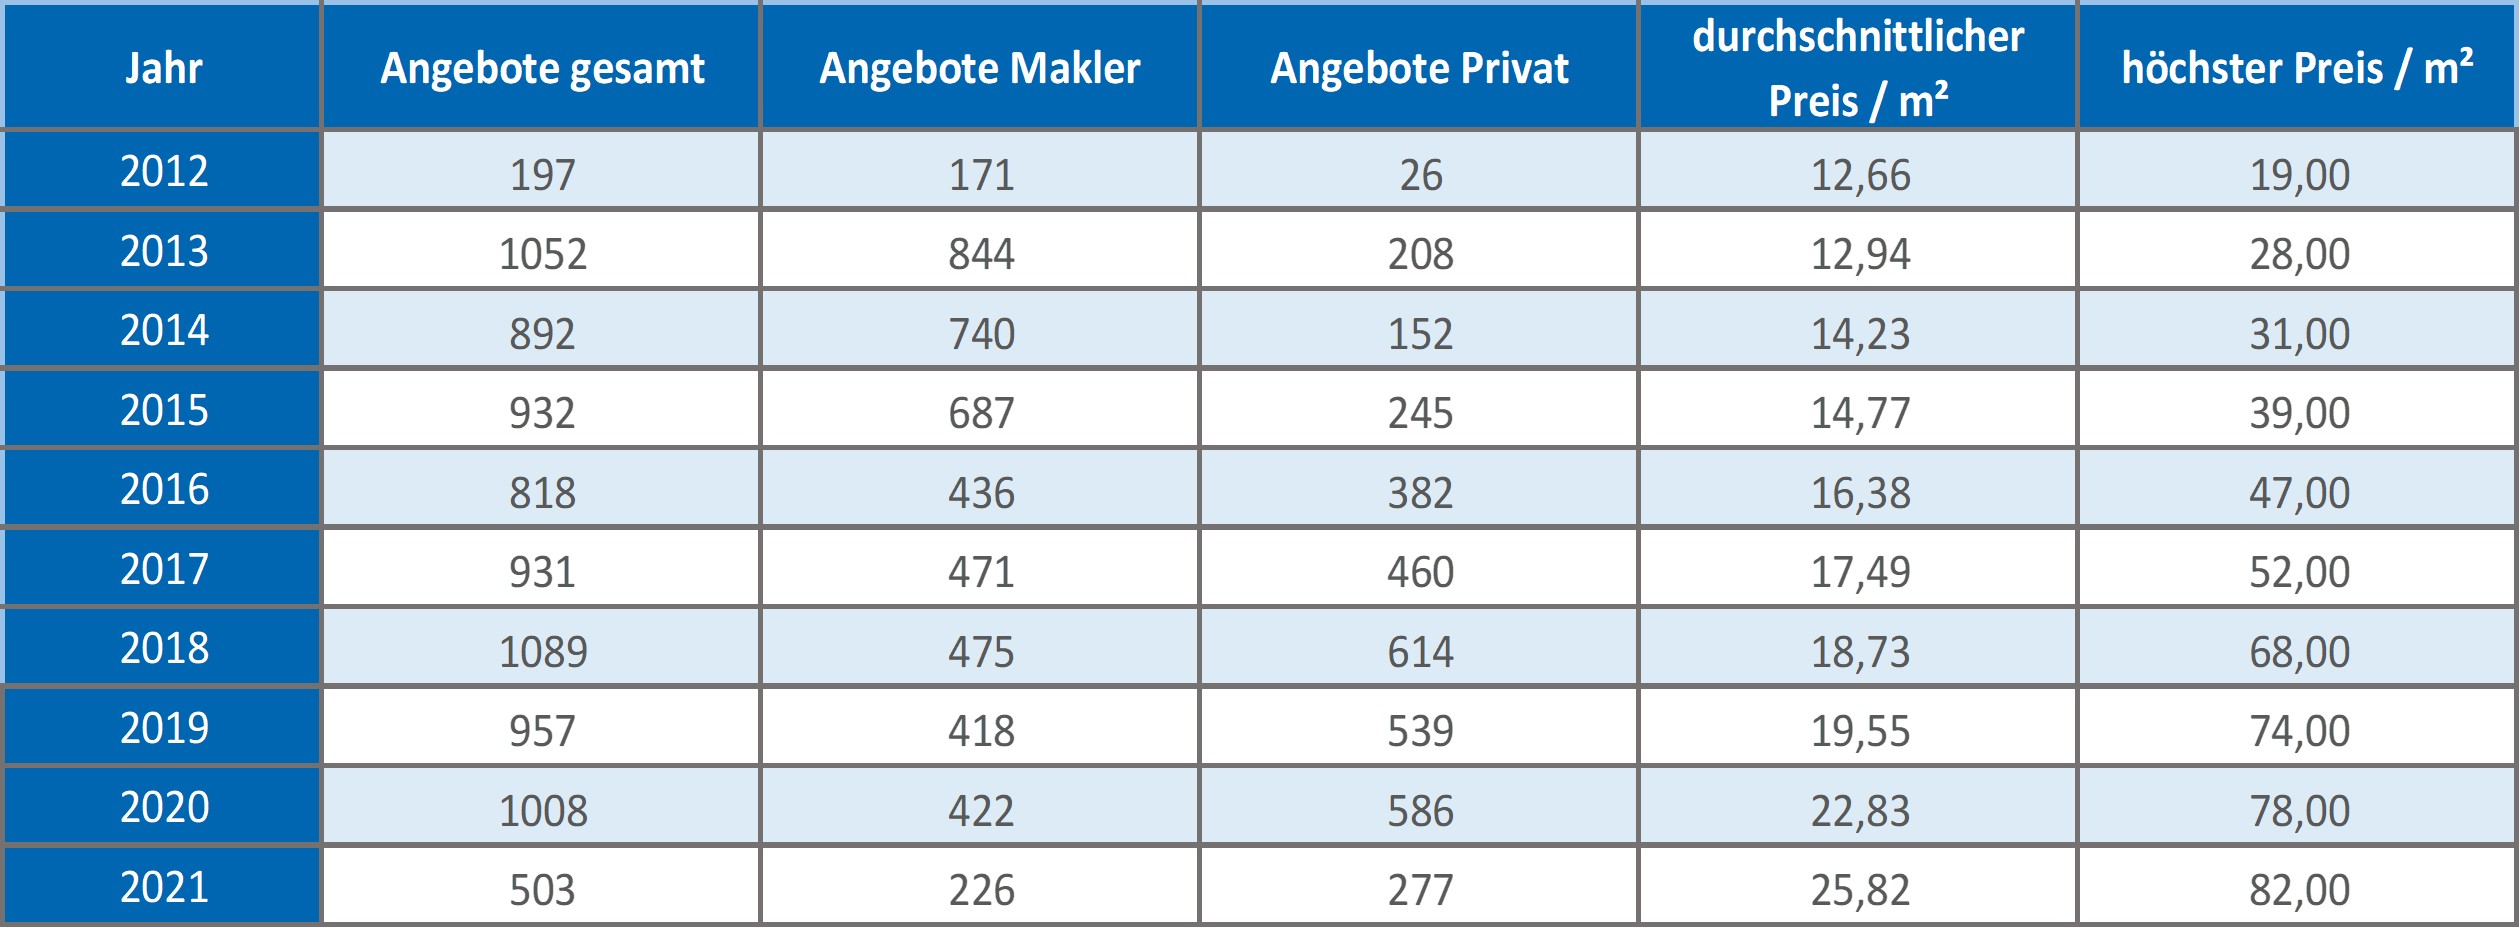 München - Obergiesing Wohnung mieten vermieten Preis Bewertung Makler 2019 2020 2021 www.happy-immo.de